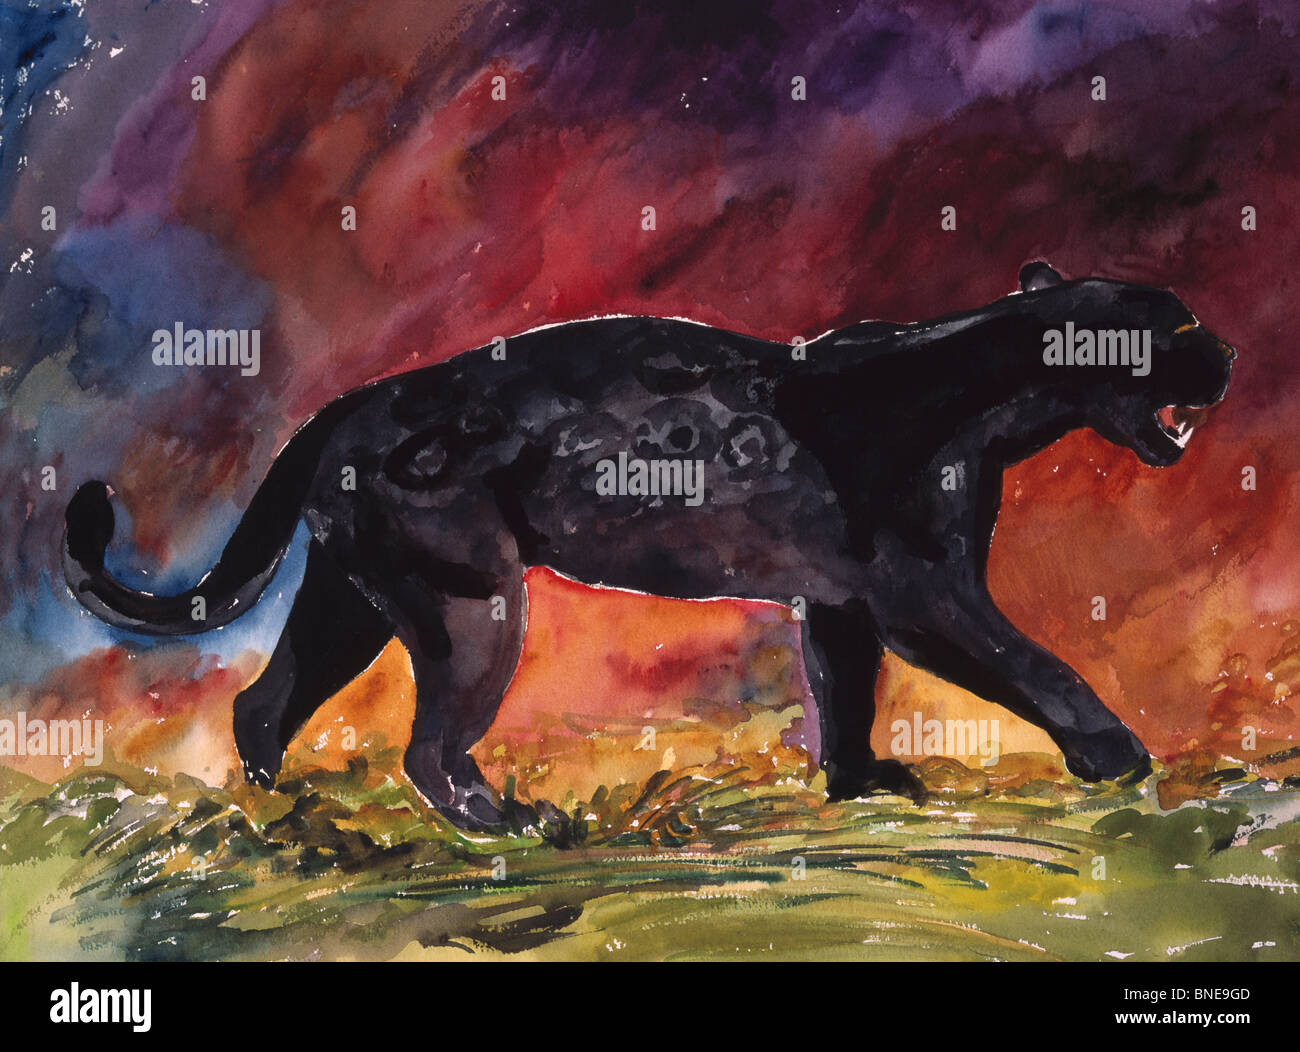 Black Jaguar Walking By John Bunker Watercolour Painting 2000 Stock Photo Alamy